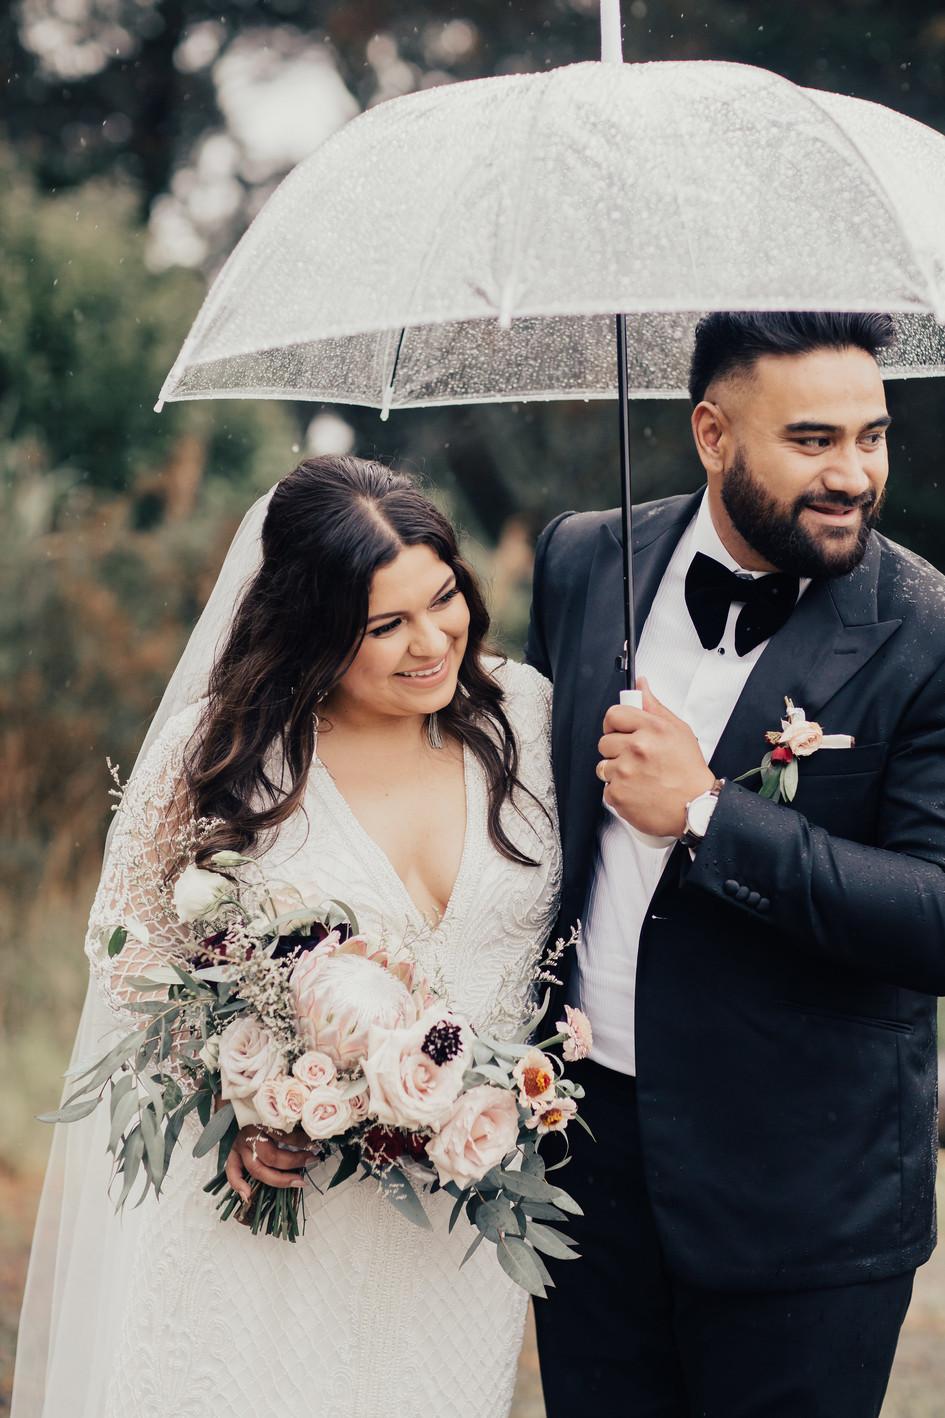 rainy_wedding_day.jpg